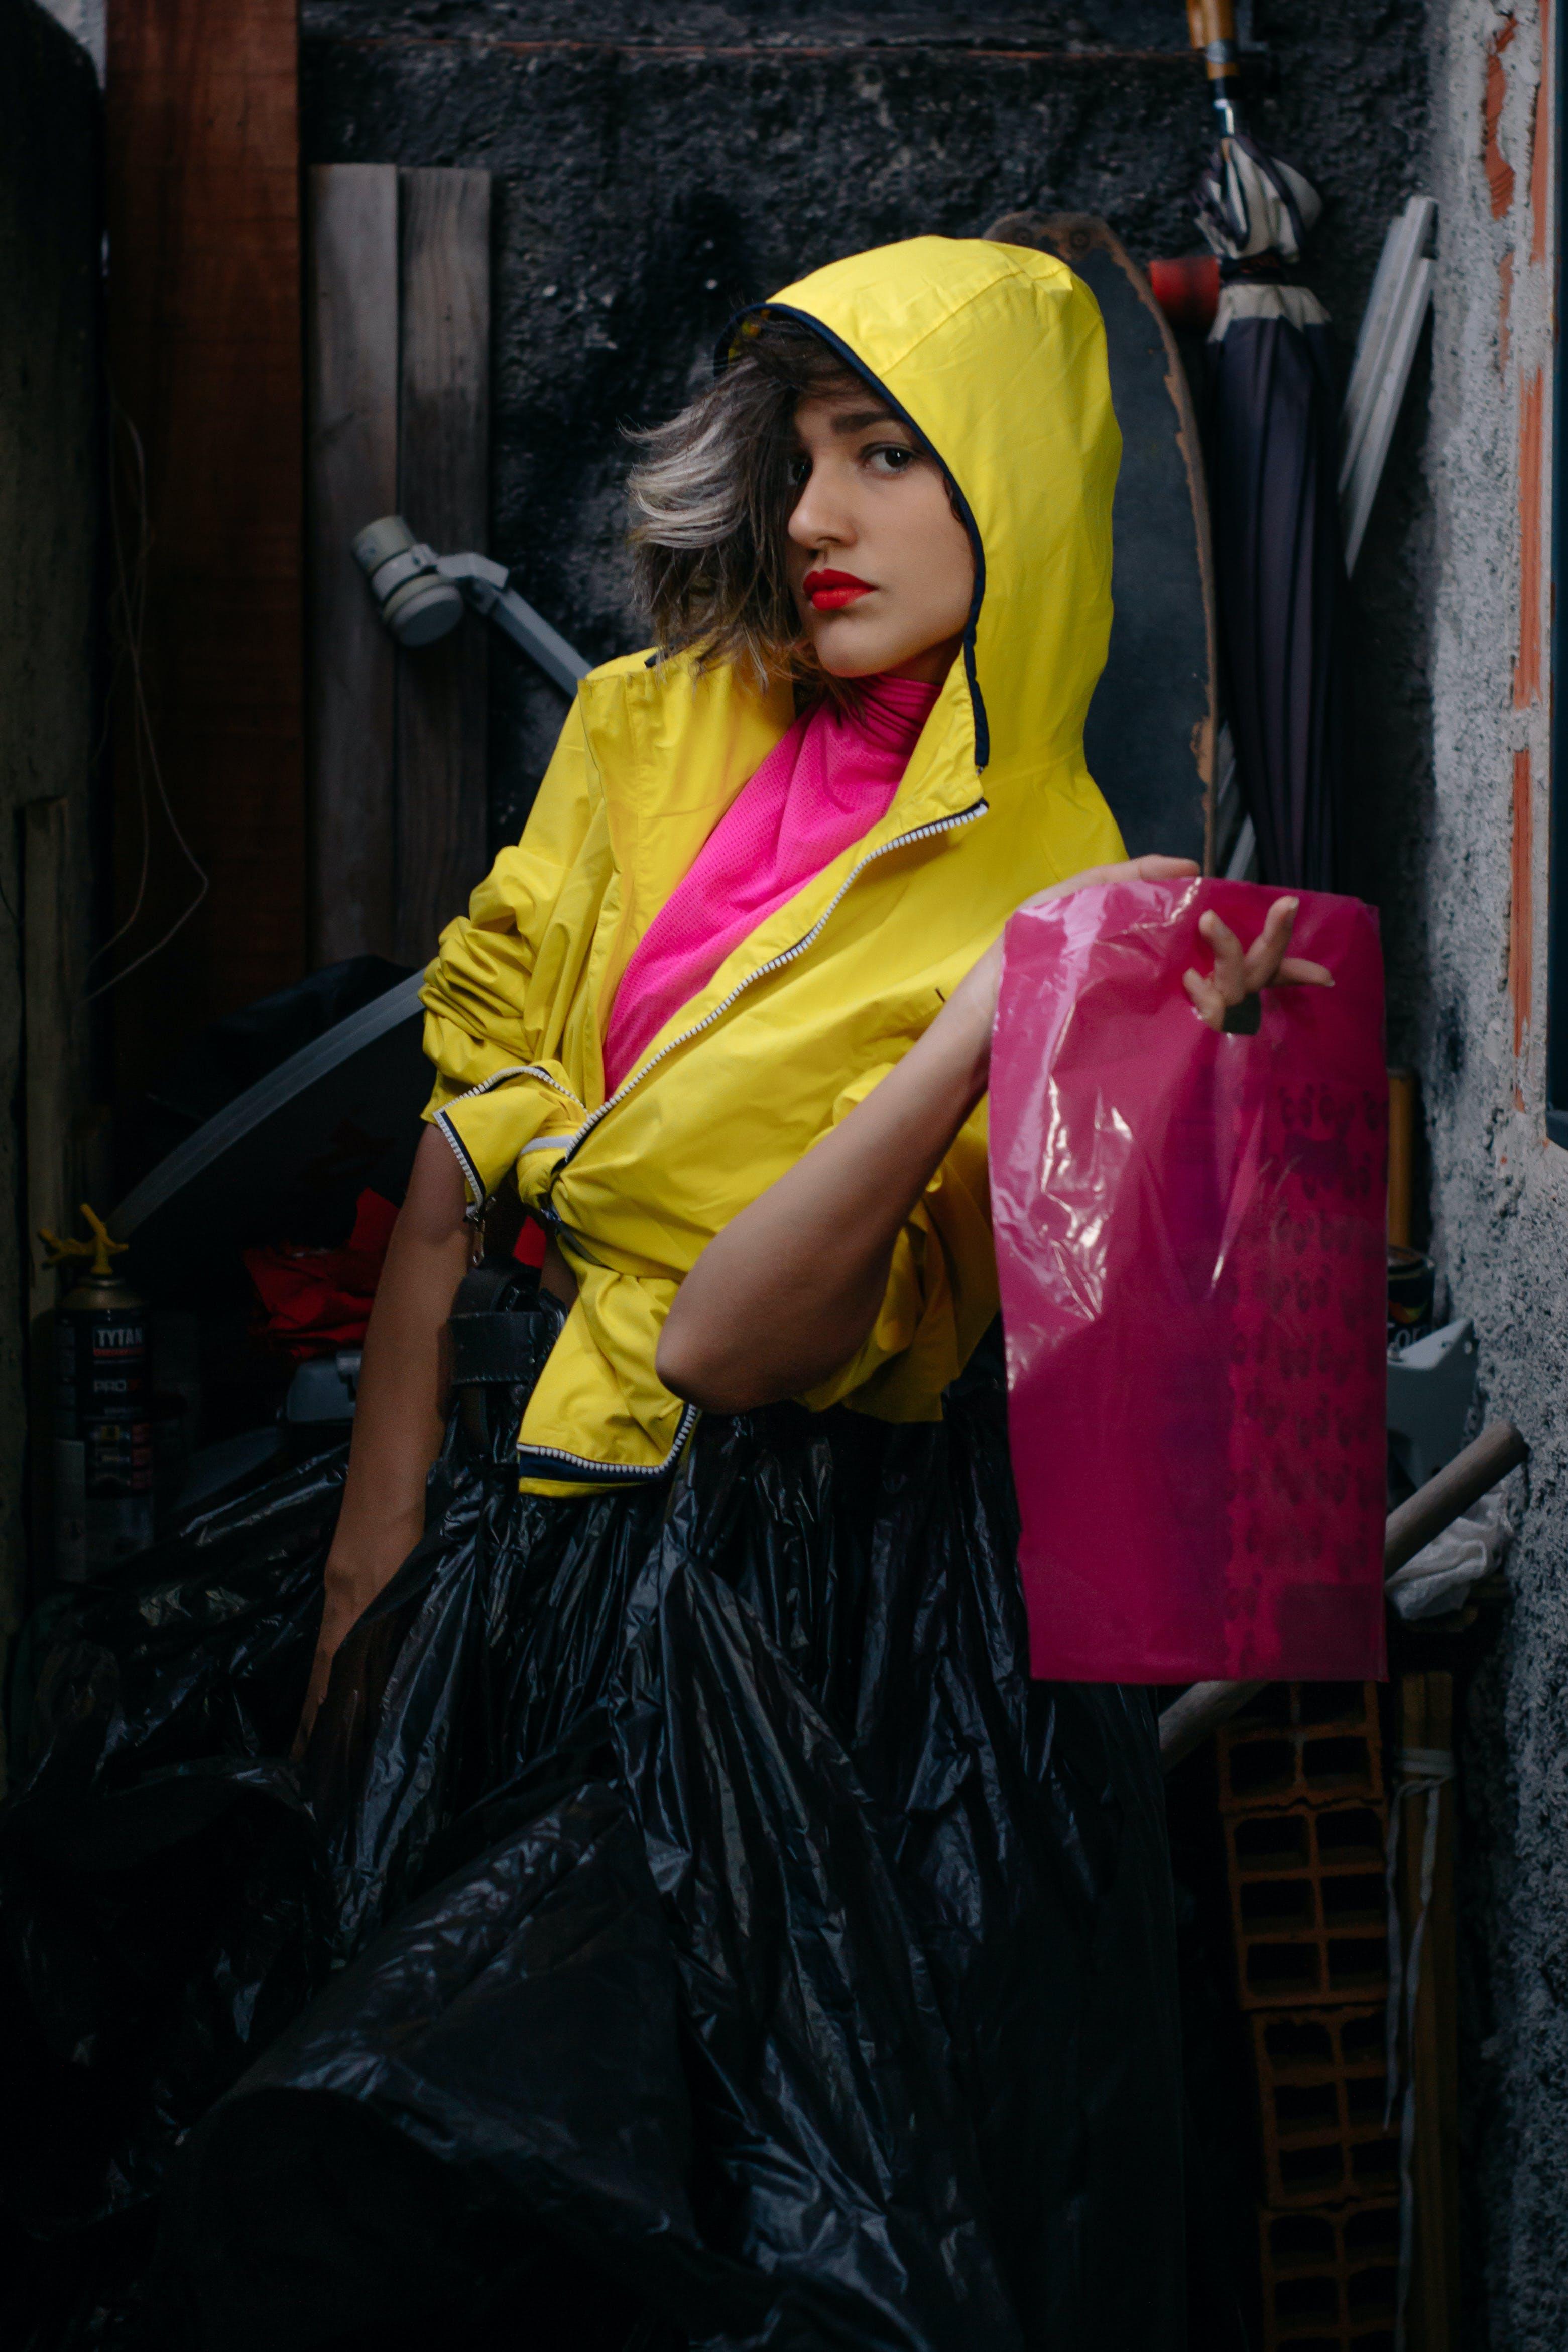 Kostenloses Stock Foto zu fashion, frau, frisur, gelb